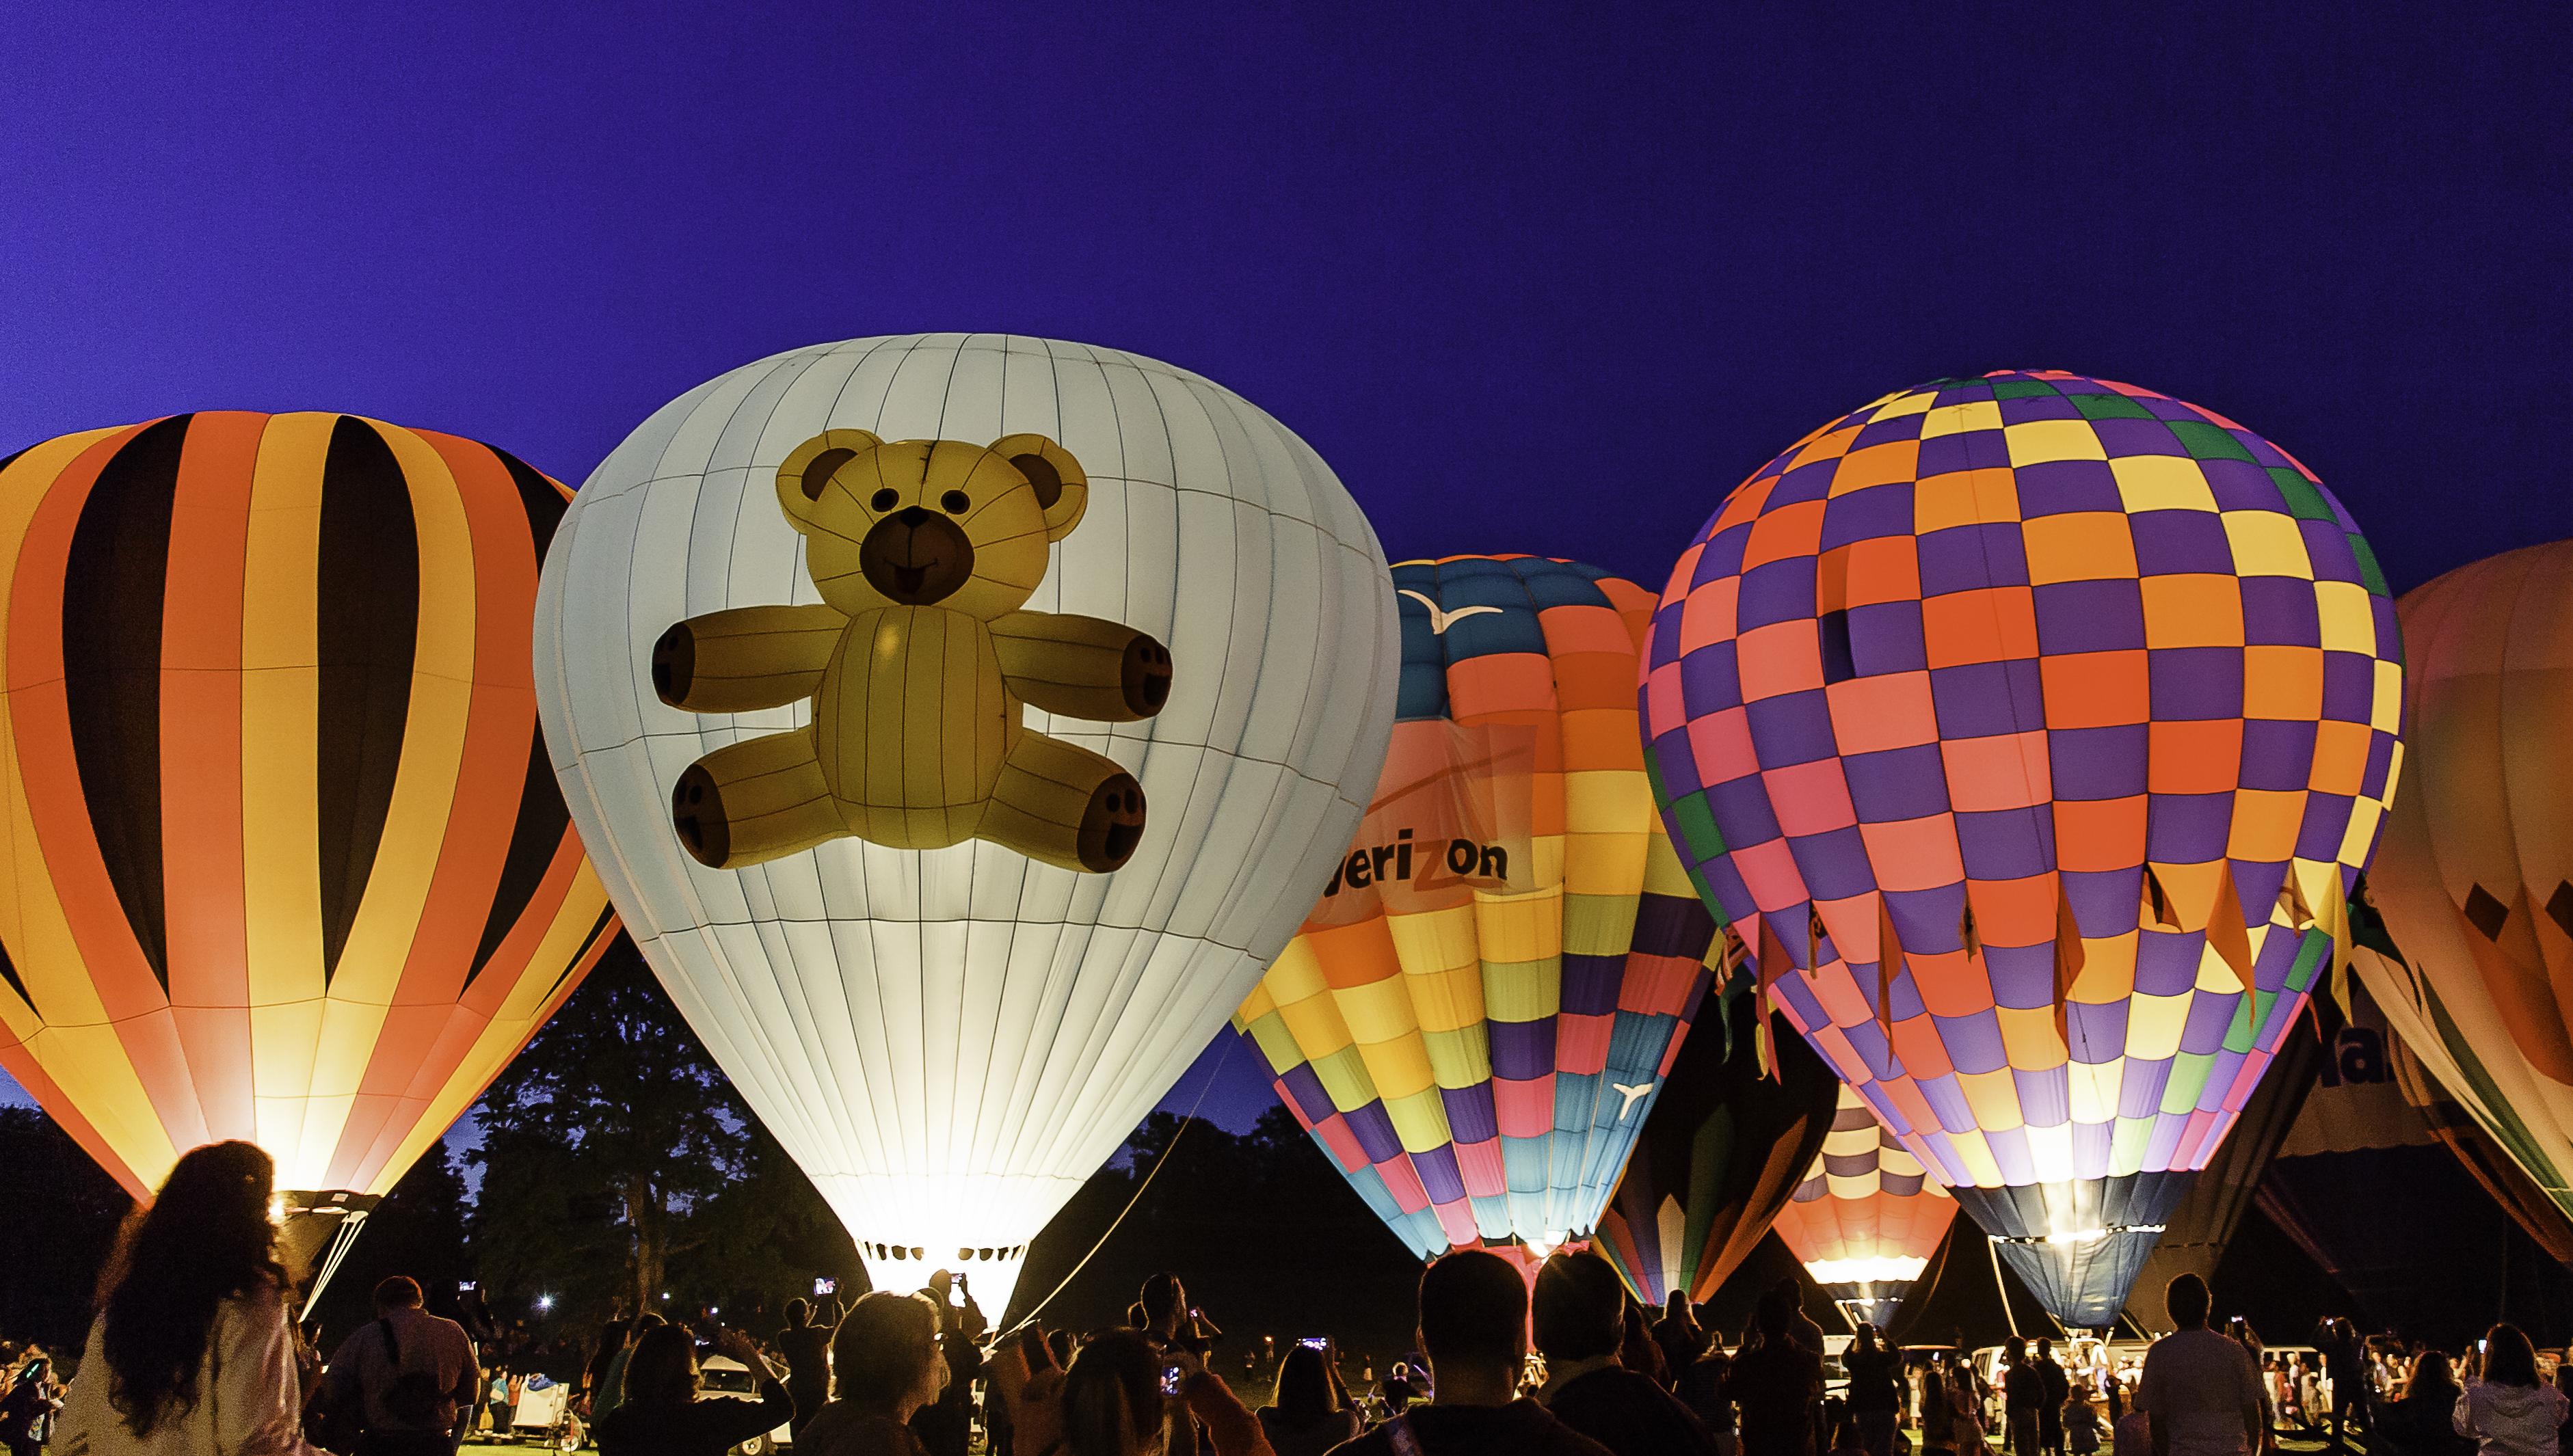 Night Glow Hot Air Balloons Festival | VisitHowardCounty.com